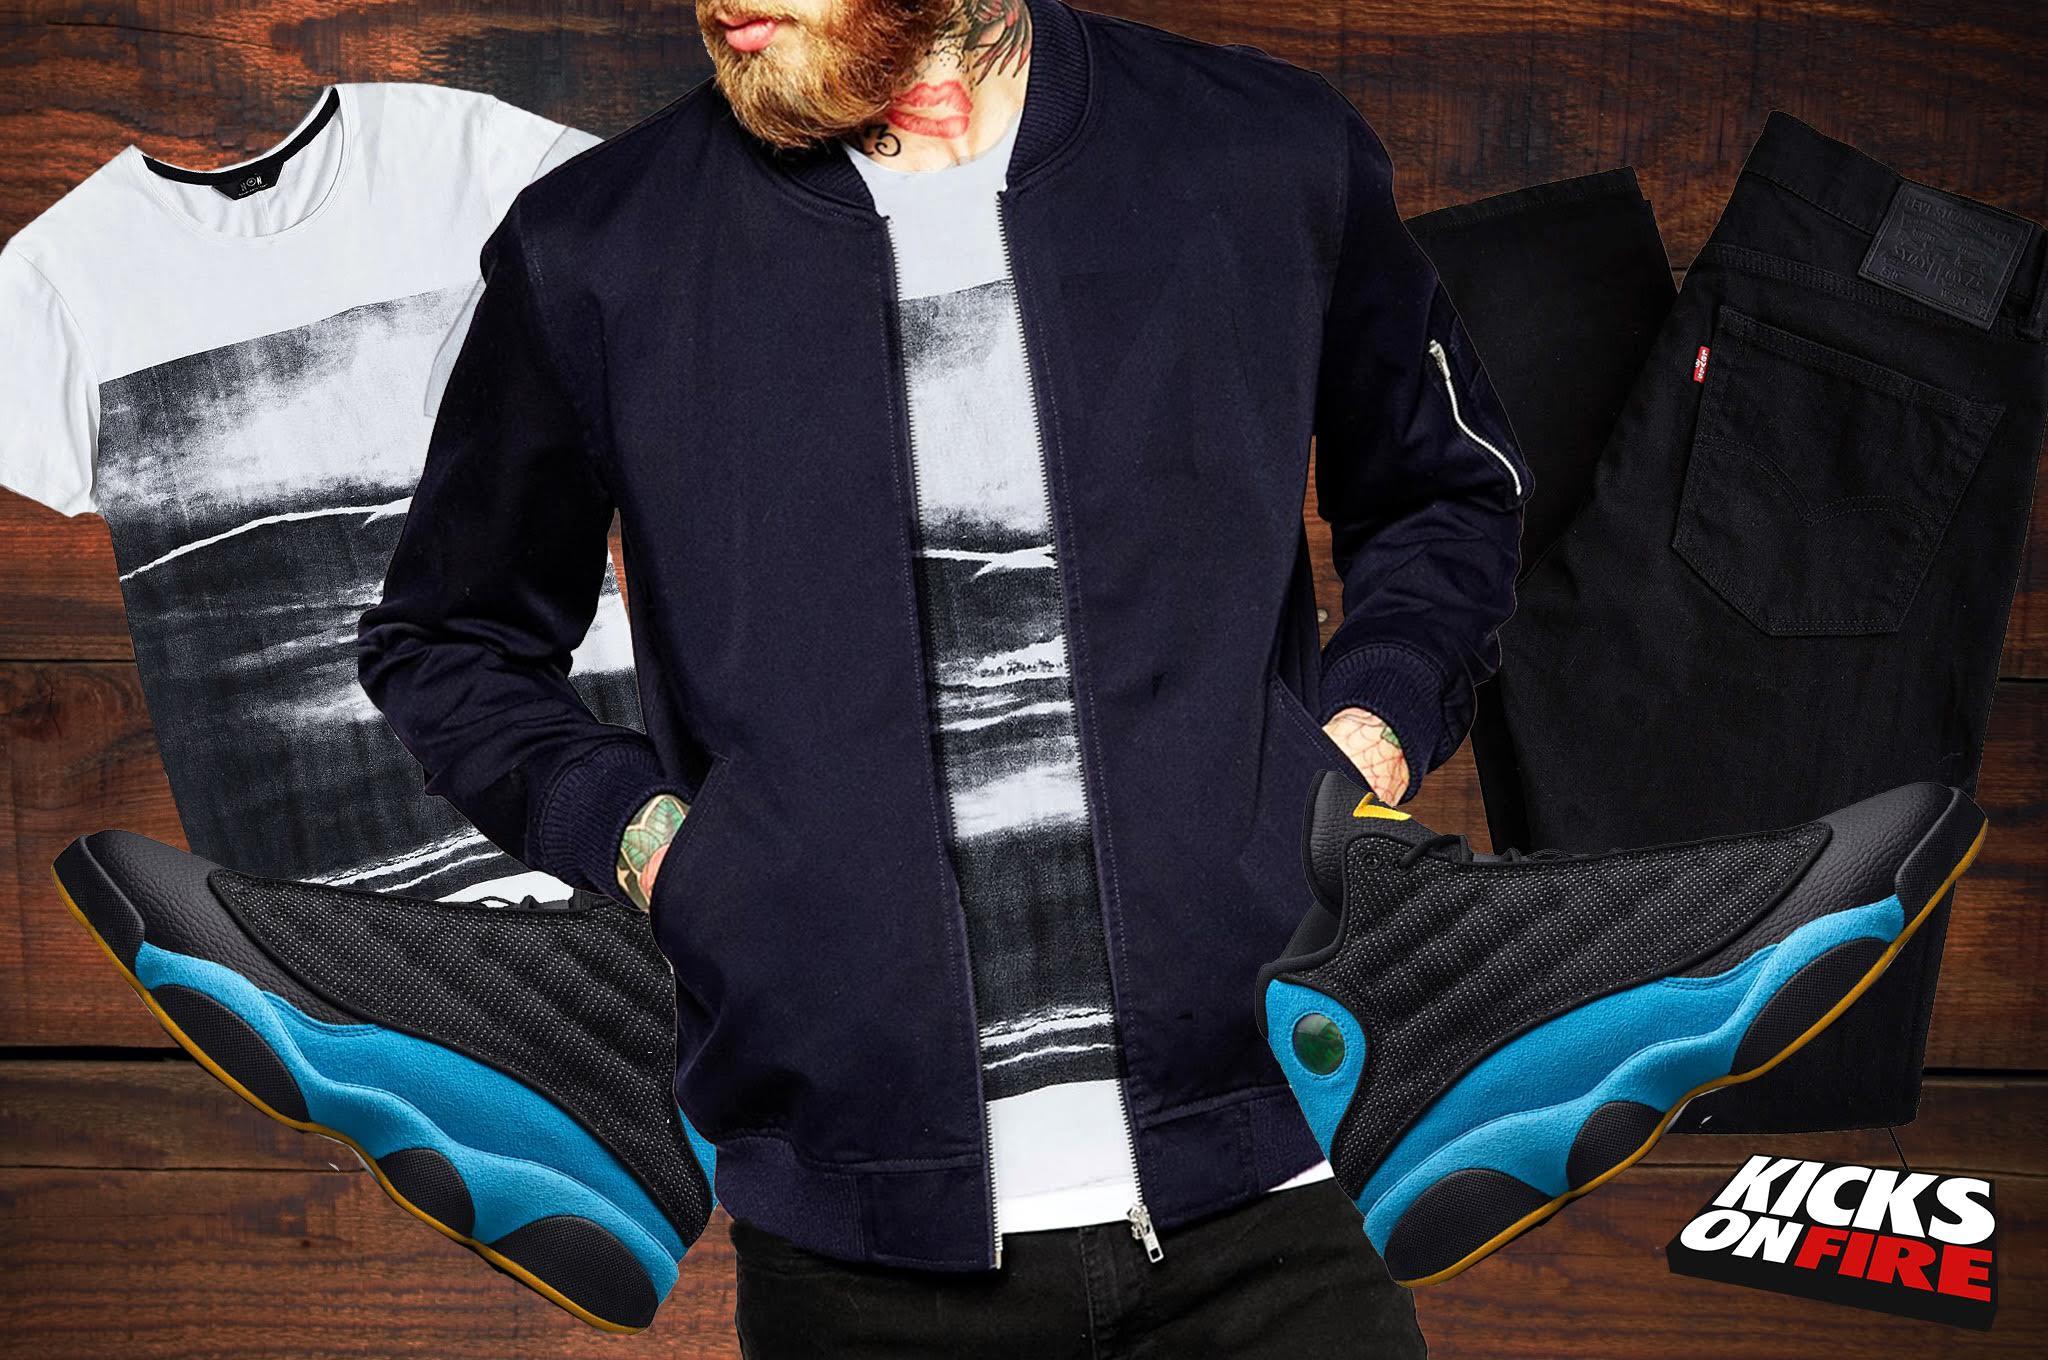 oveja presumir Decaer  SneakerFits: Let's Go Subtle With The Air Jordan 13 CP3